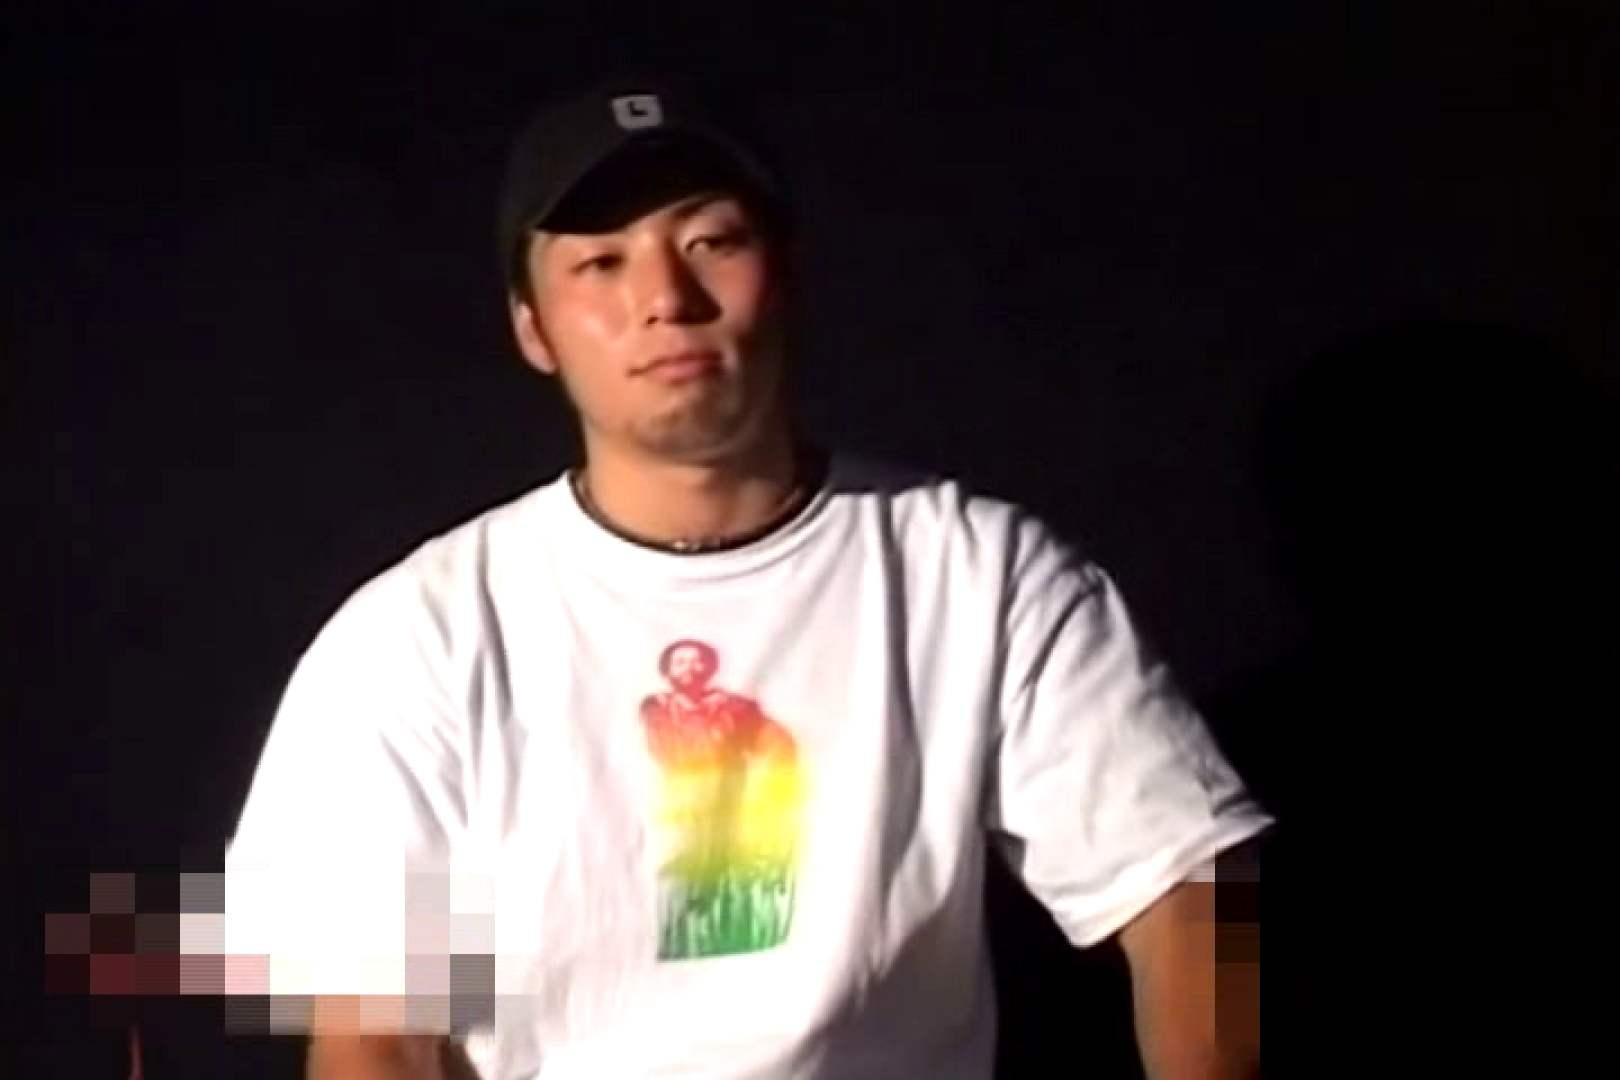 Beautiful muscle モッコリ野郎達!Vol.04 フェラ男子 ゲイフリーエロ画像 49連発 3